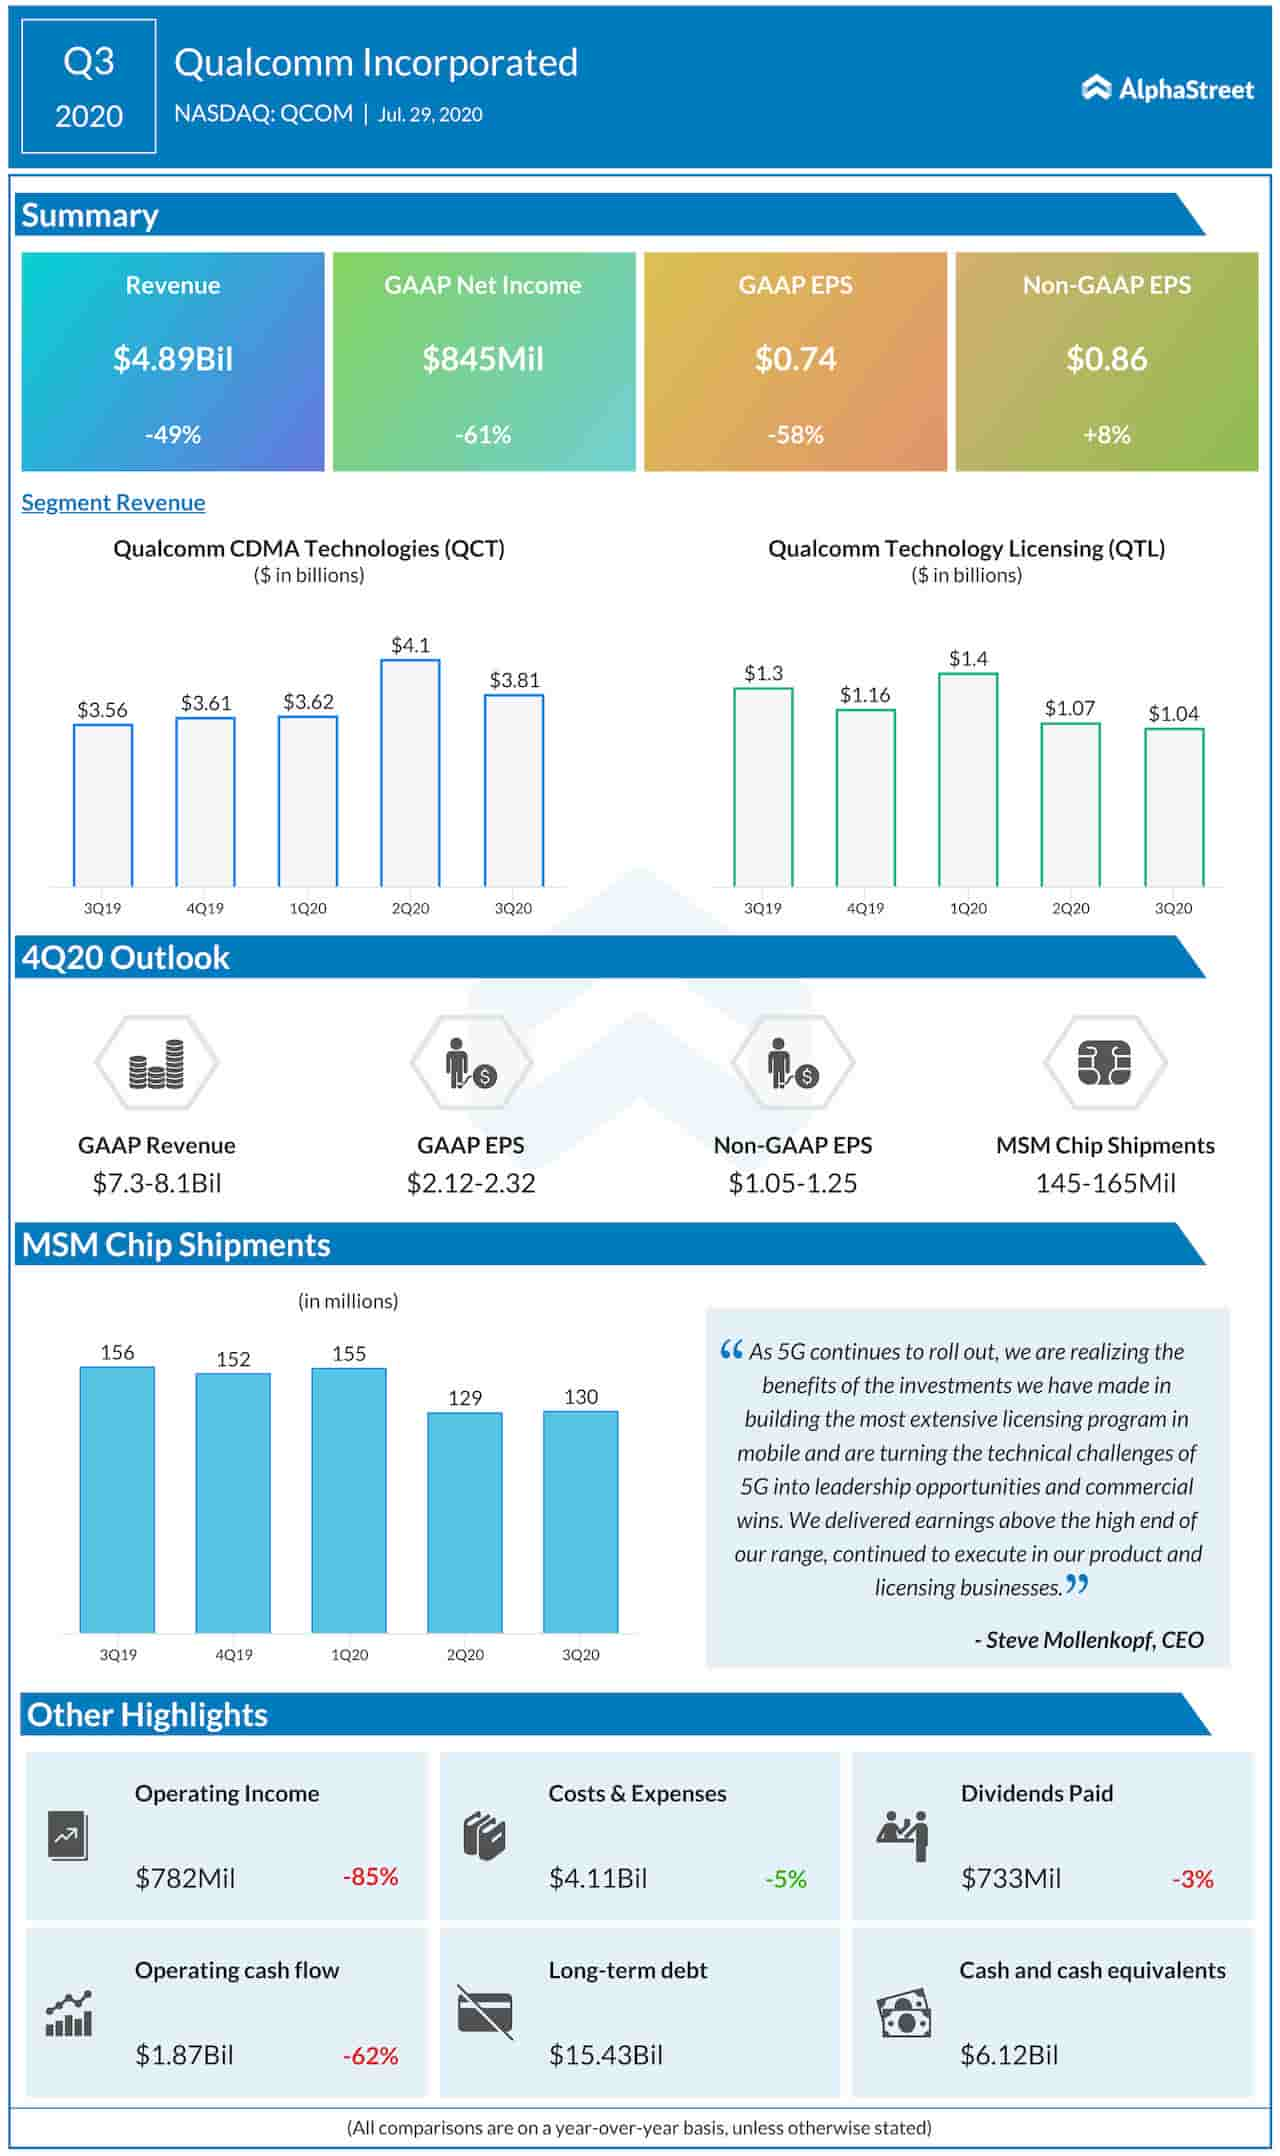 Qualcomm Q3 2020 Earnings Infographic